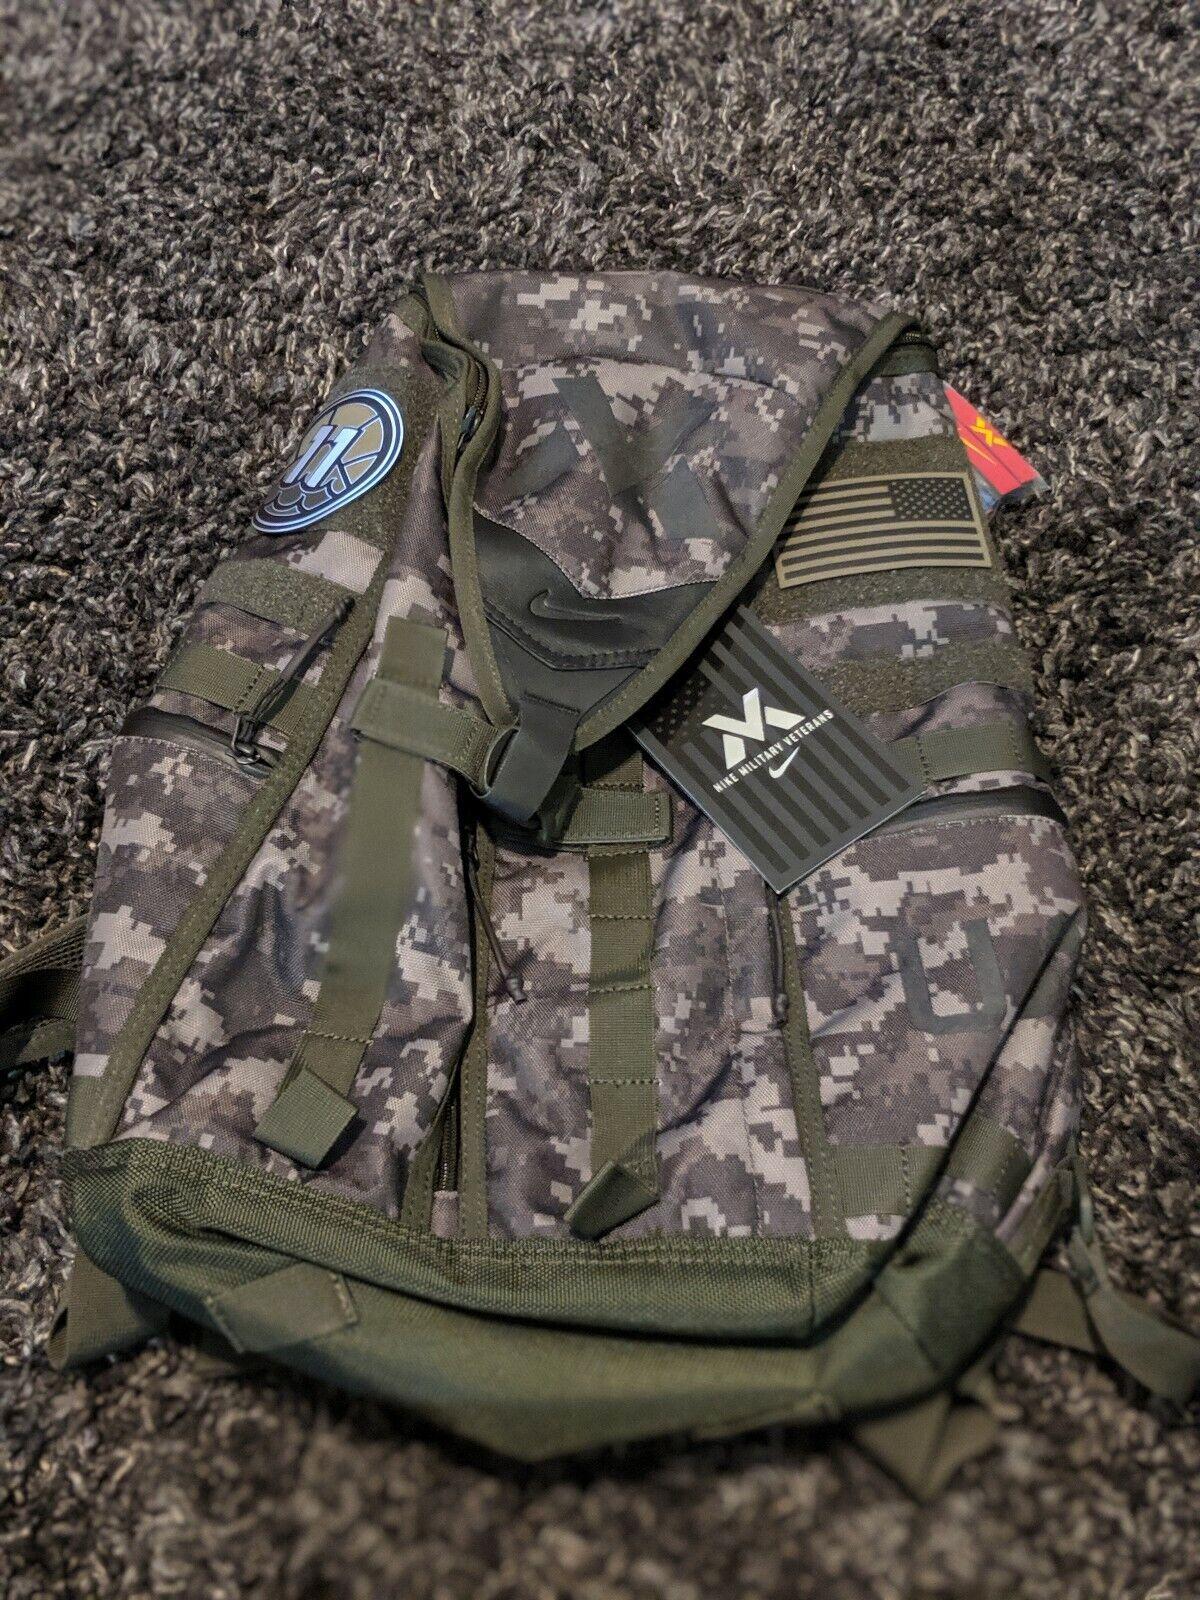 Presa entregar aguacero  Nike NMV Recruit Veterans Zip3 Backpack Camo Olive Sequoia Black Bz9823 222  for sale online | eBay